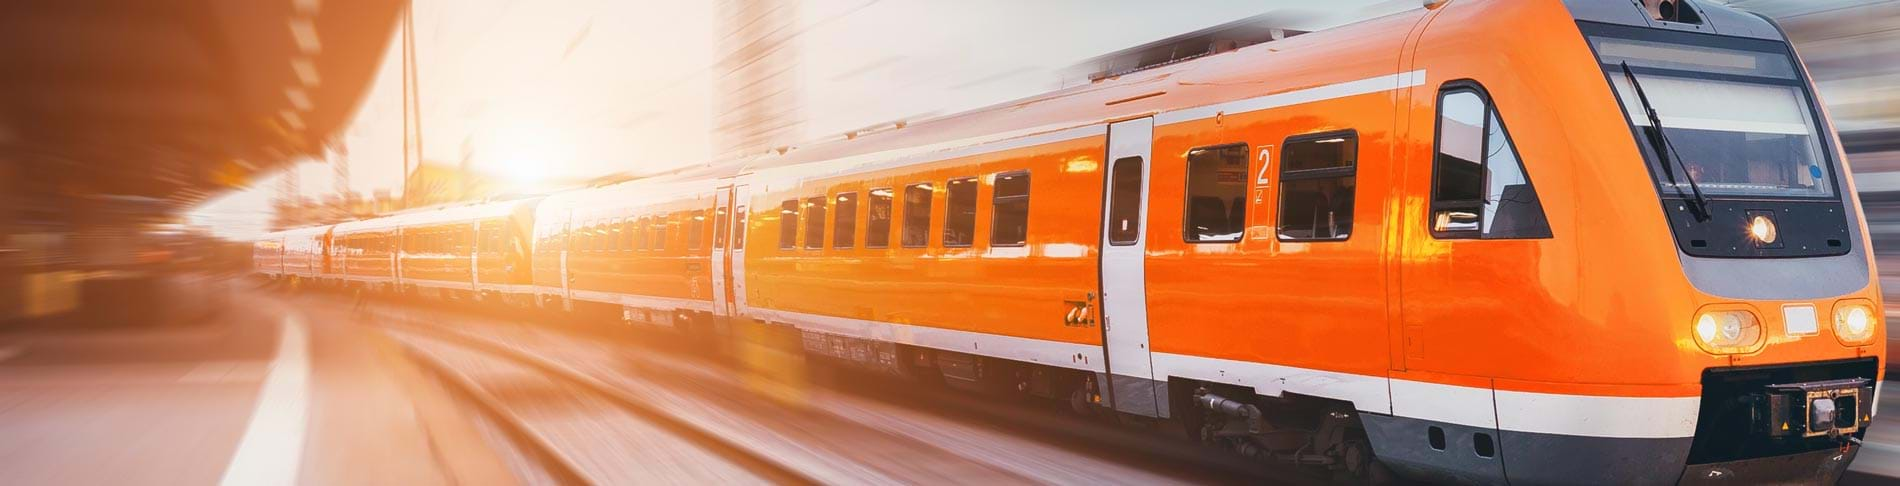 Eland Cables - Rail & Metro cables